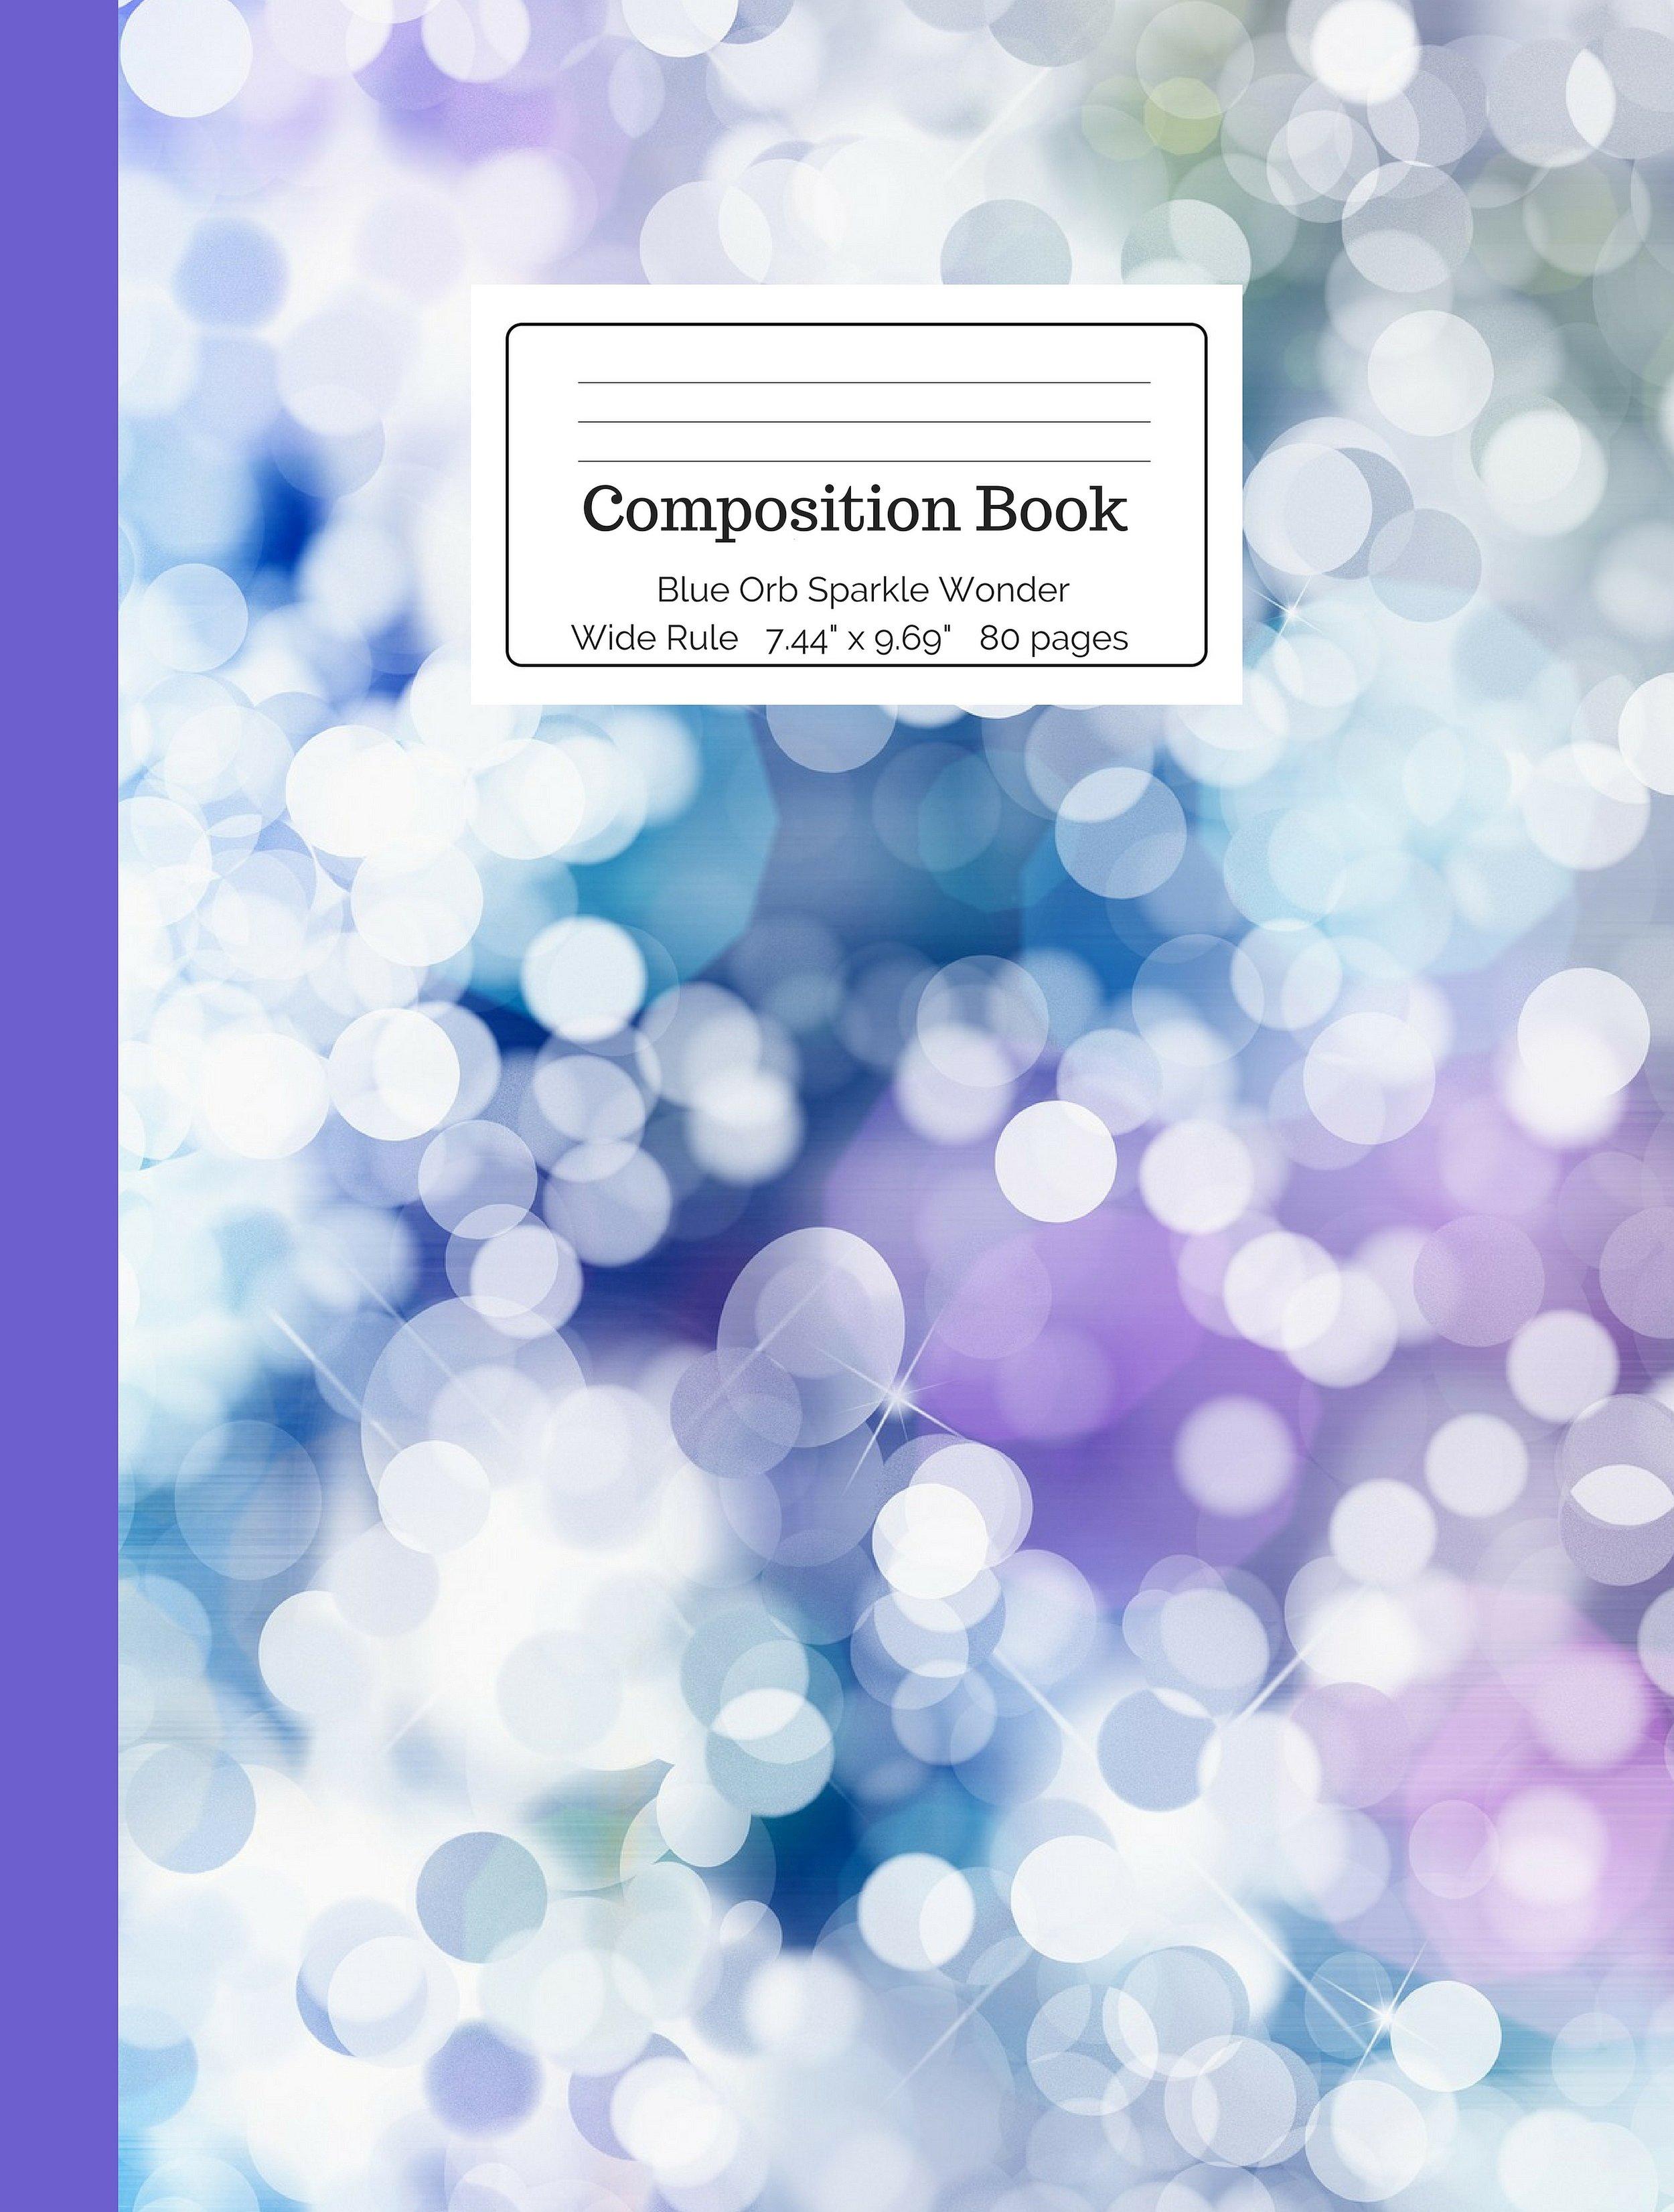 Blue Orb Sparkle Wonder Composition Book